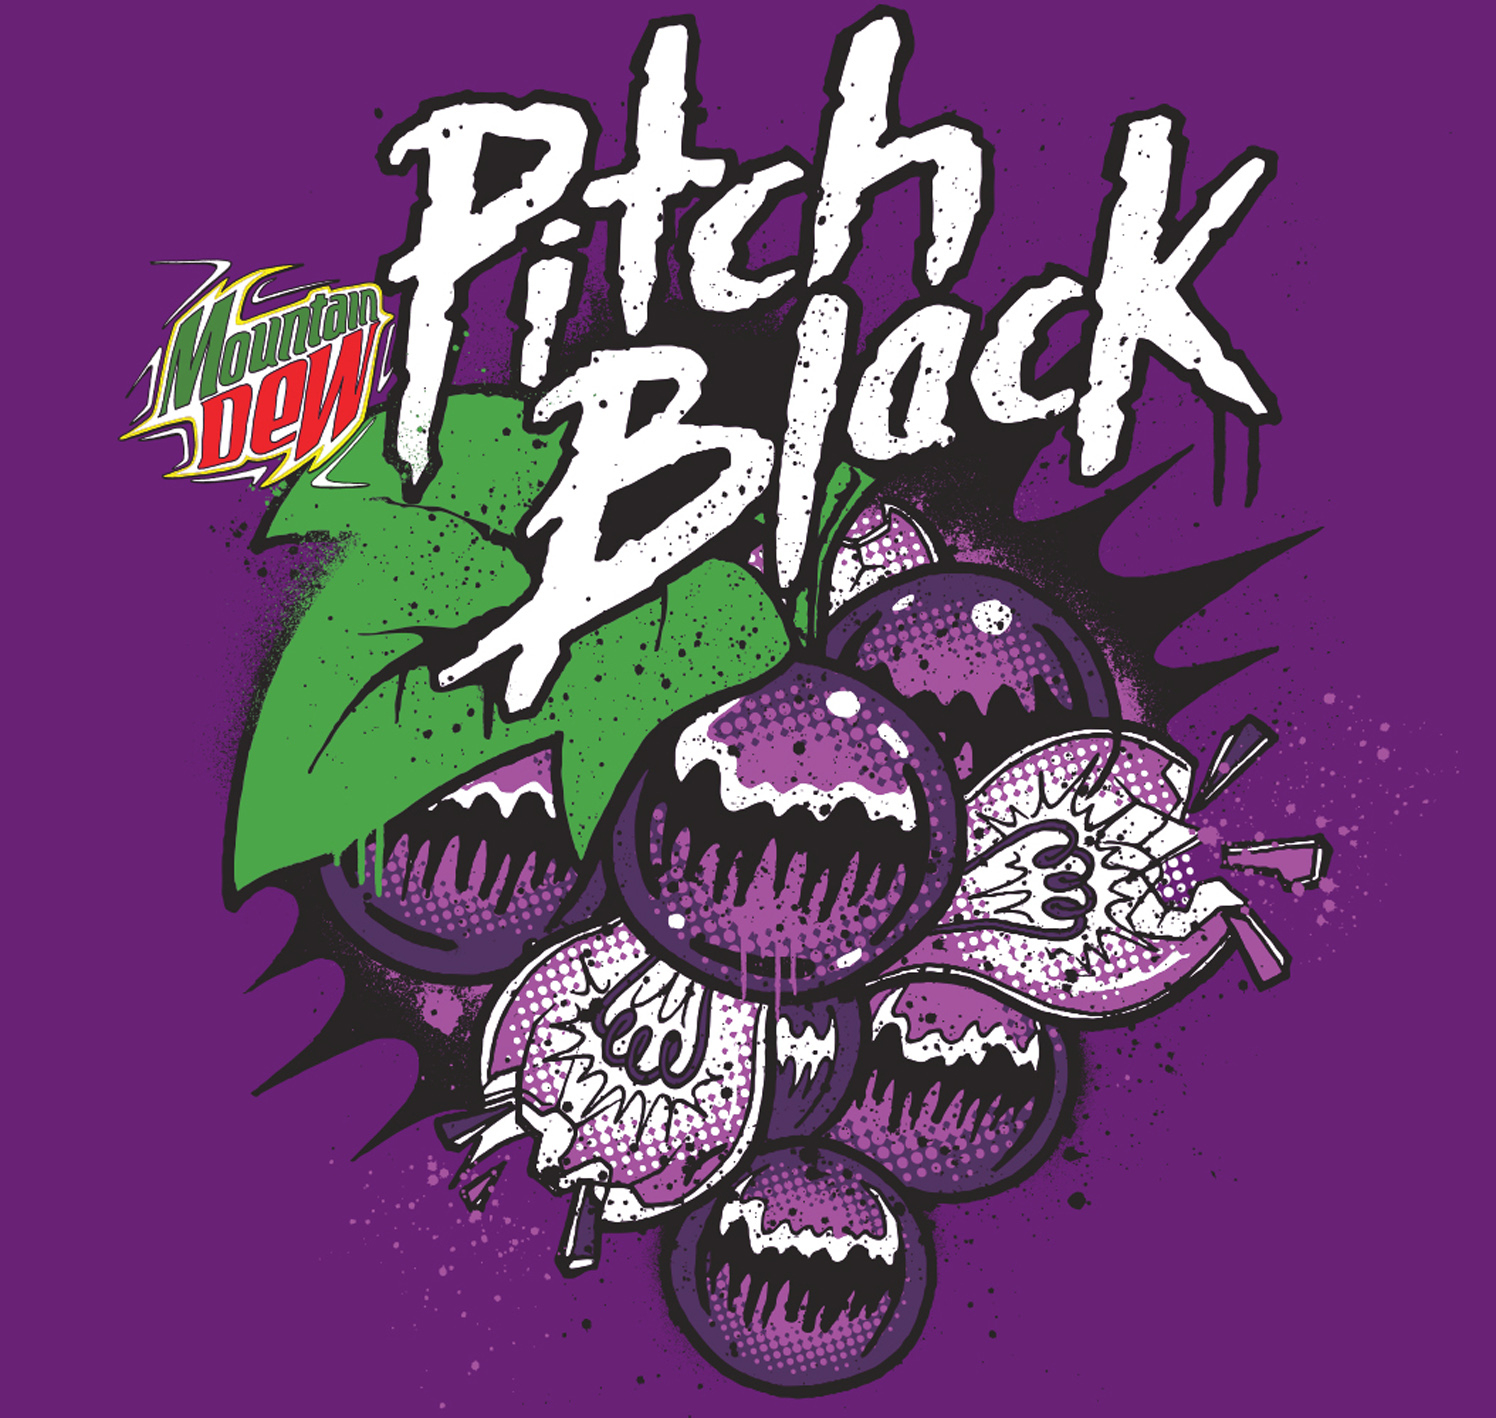 Pitch Black / Mountain Dew